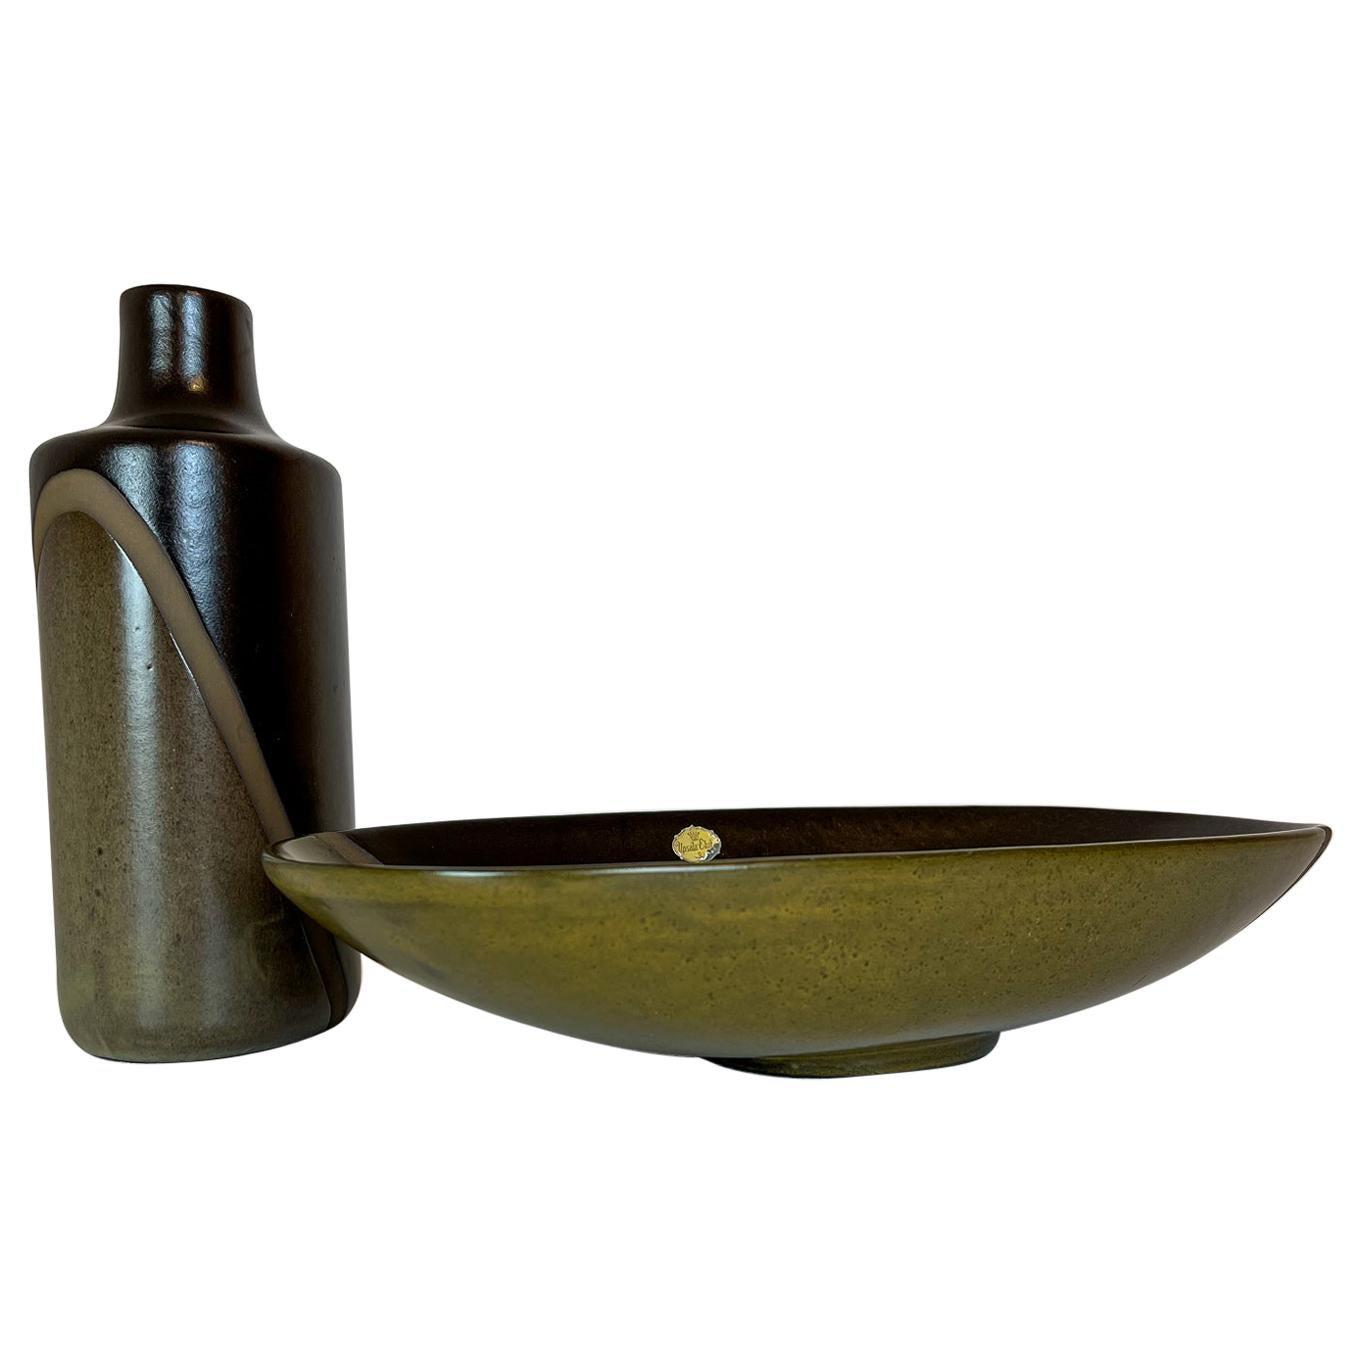 "Midcentury Set of Vase and Bowl ""Diagonal"" by Upsala Ekeby, Sweden, 1950s"